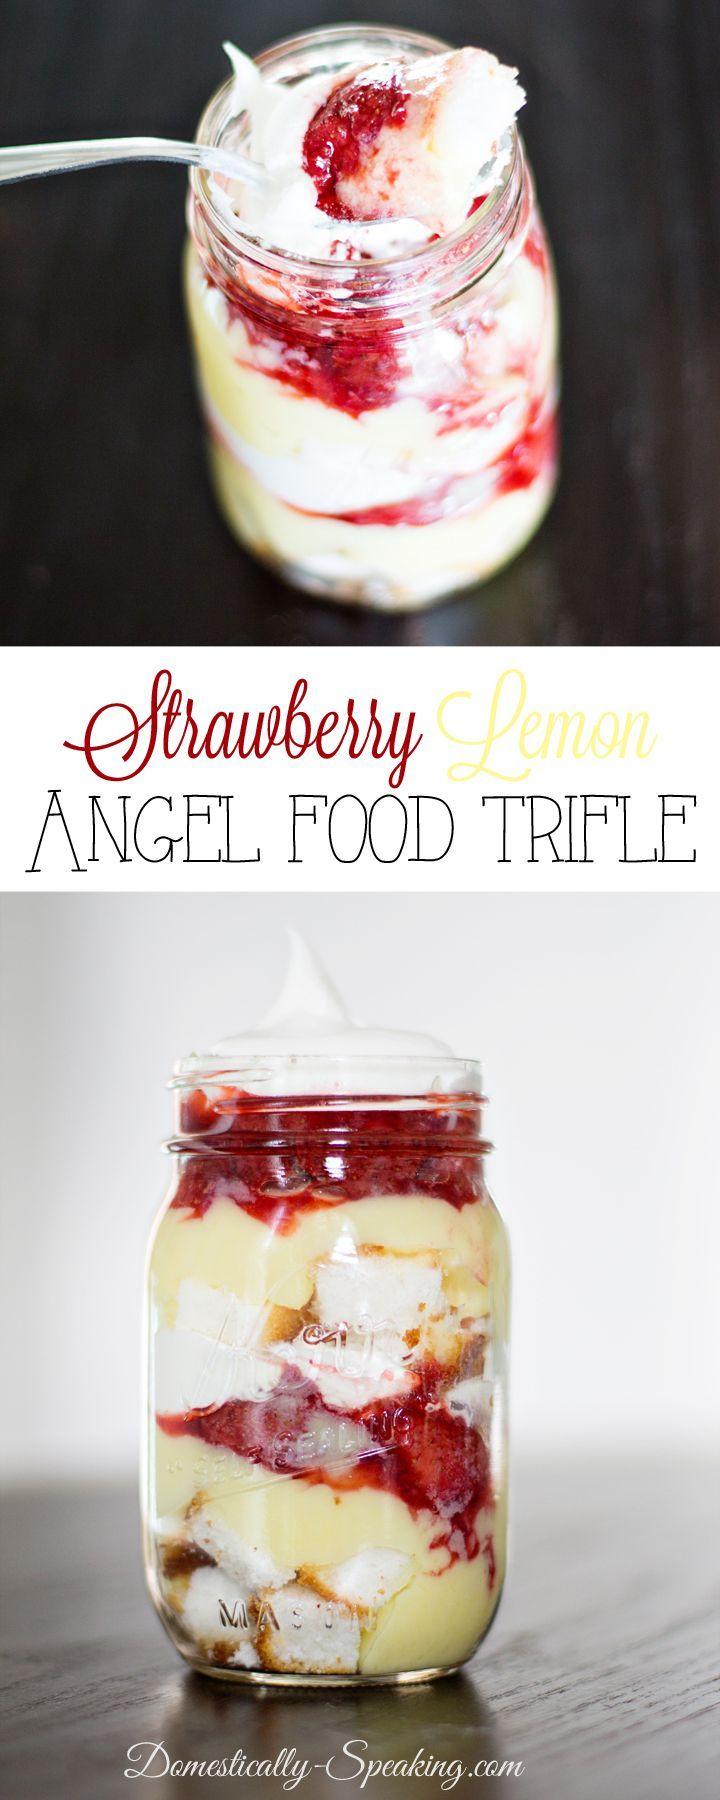 Strawberry Lemon Angel Food Trifle - 25+ things to eat in a mason jar - NoBiggie.net